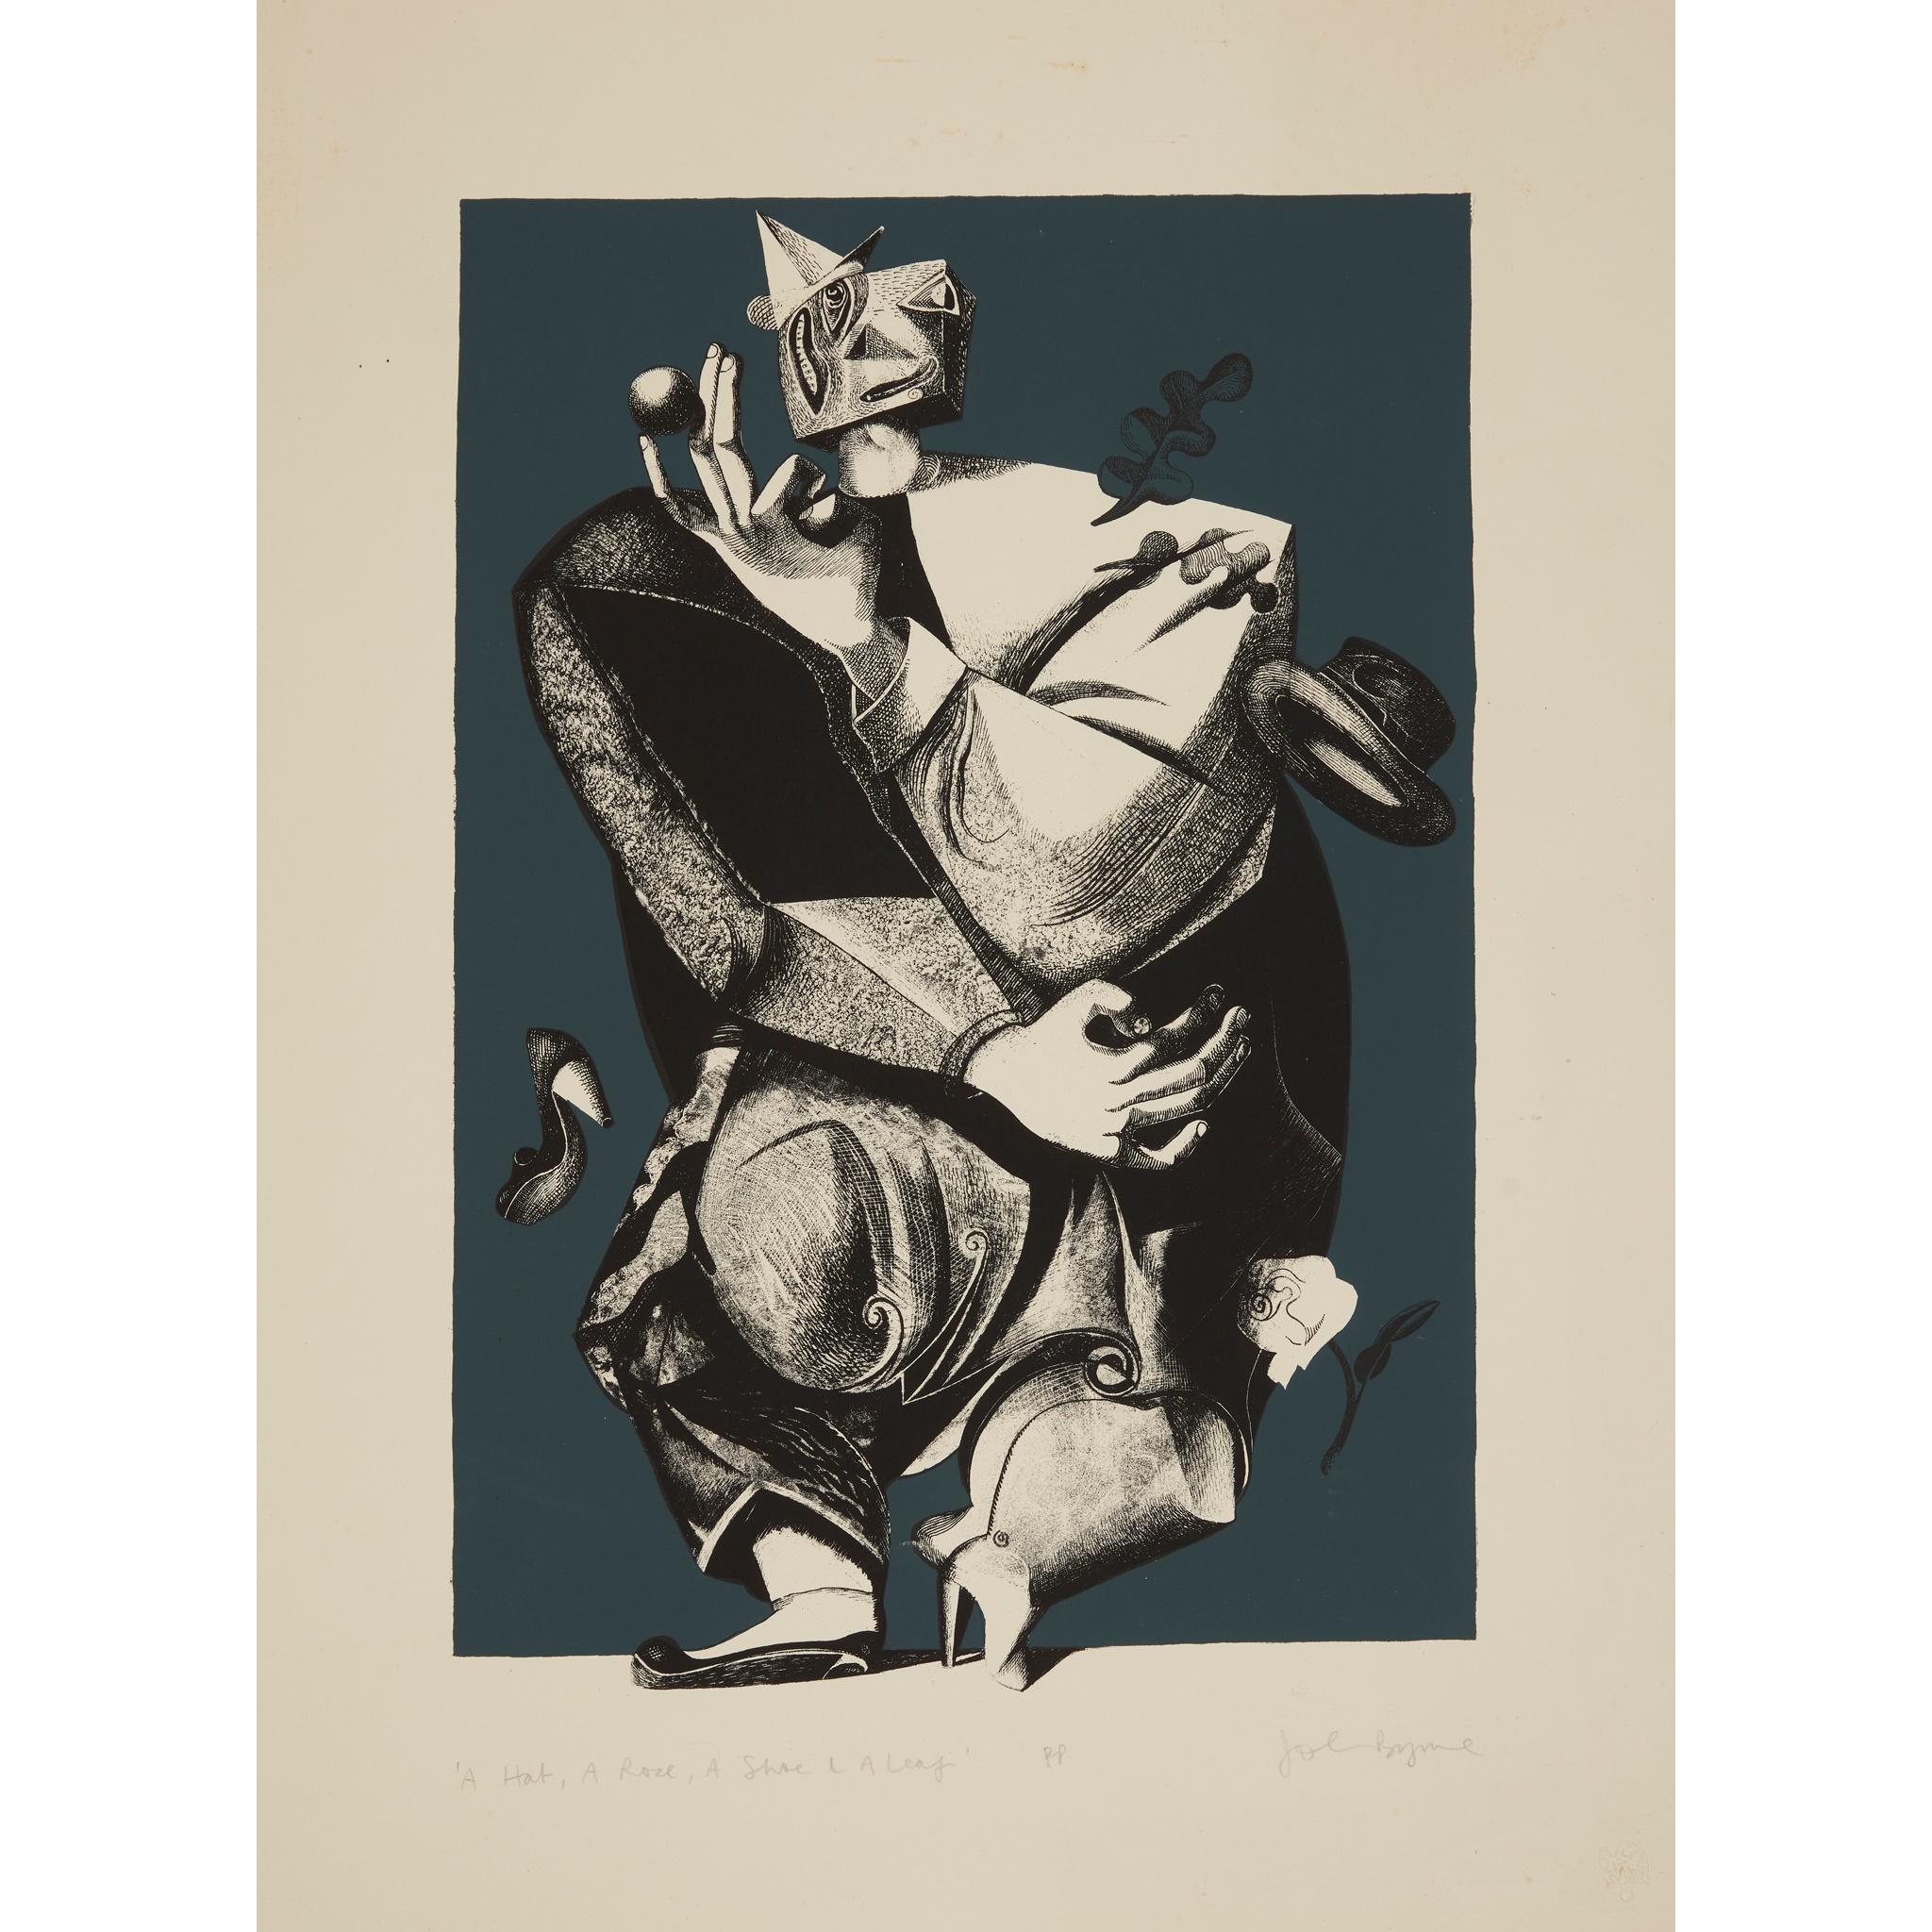 § JOHN BYRNE (SCOTTISH 1940-) A HAT, A ROSE, A SHOE AND A LEAF - 1999 - Image 2 of 2